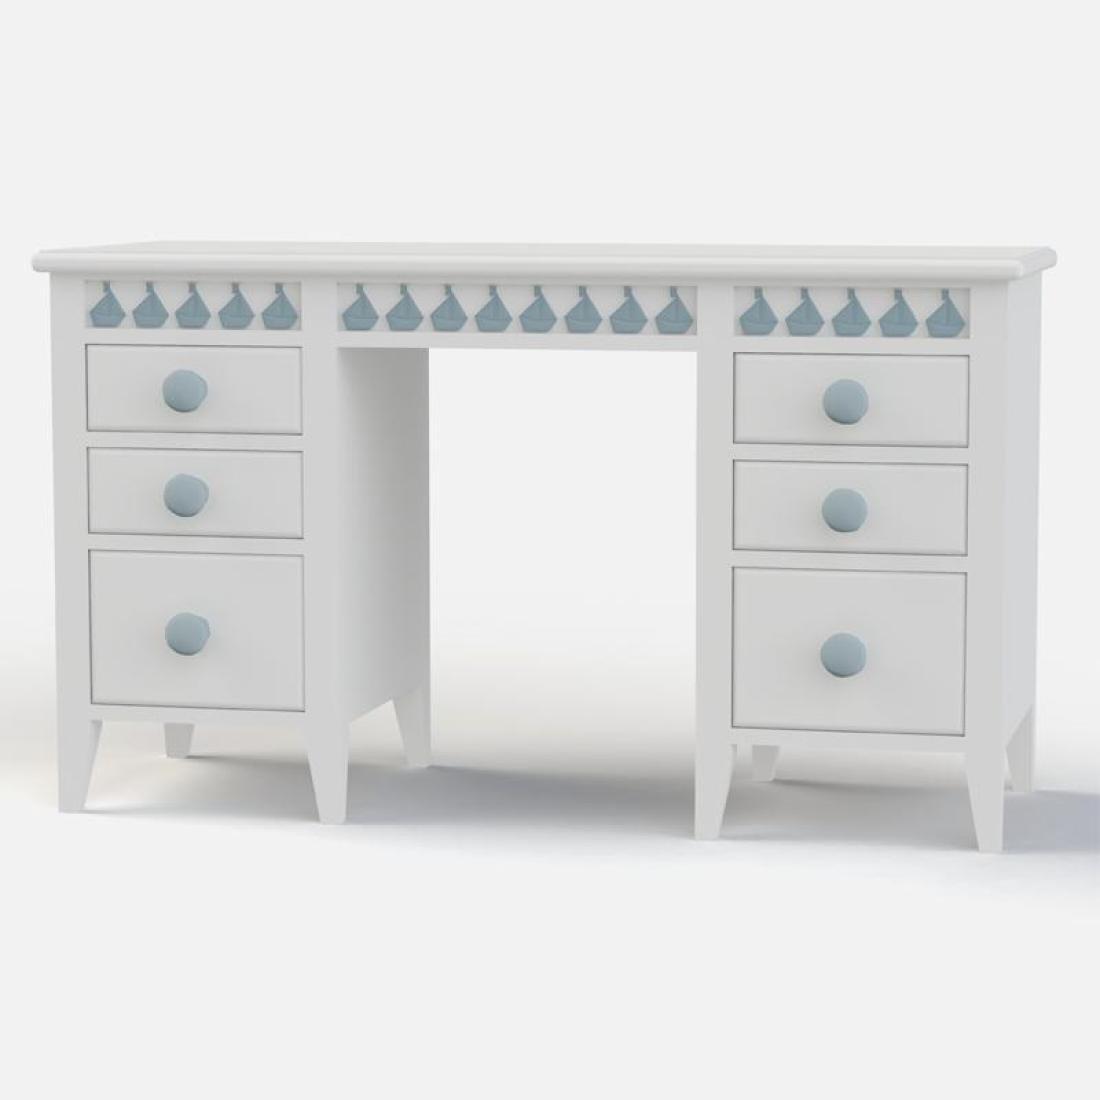 Little Buoy Blue Double Desk Solid Wooden Boys Desk